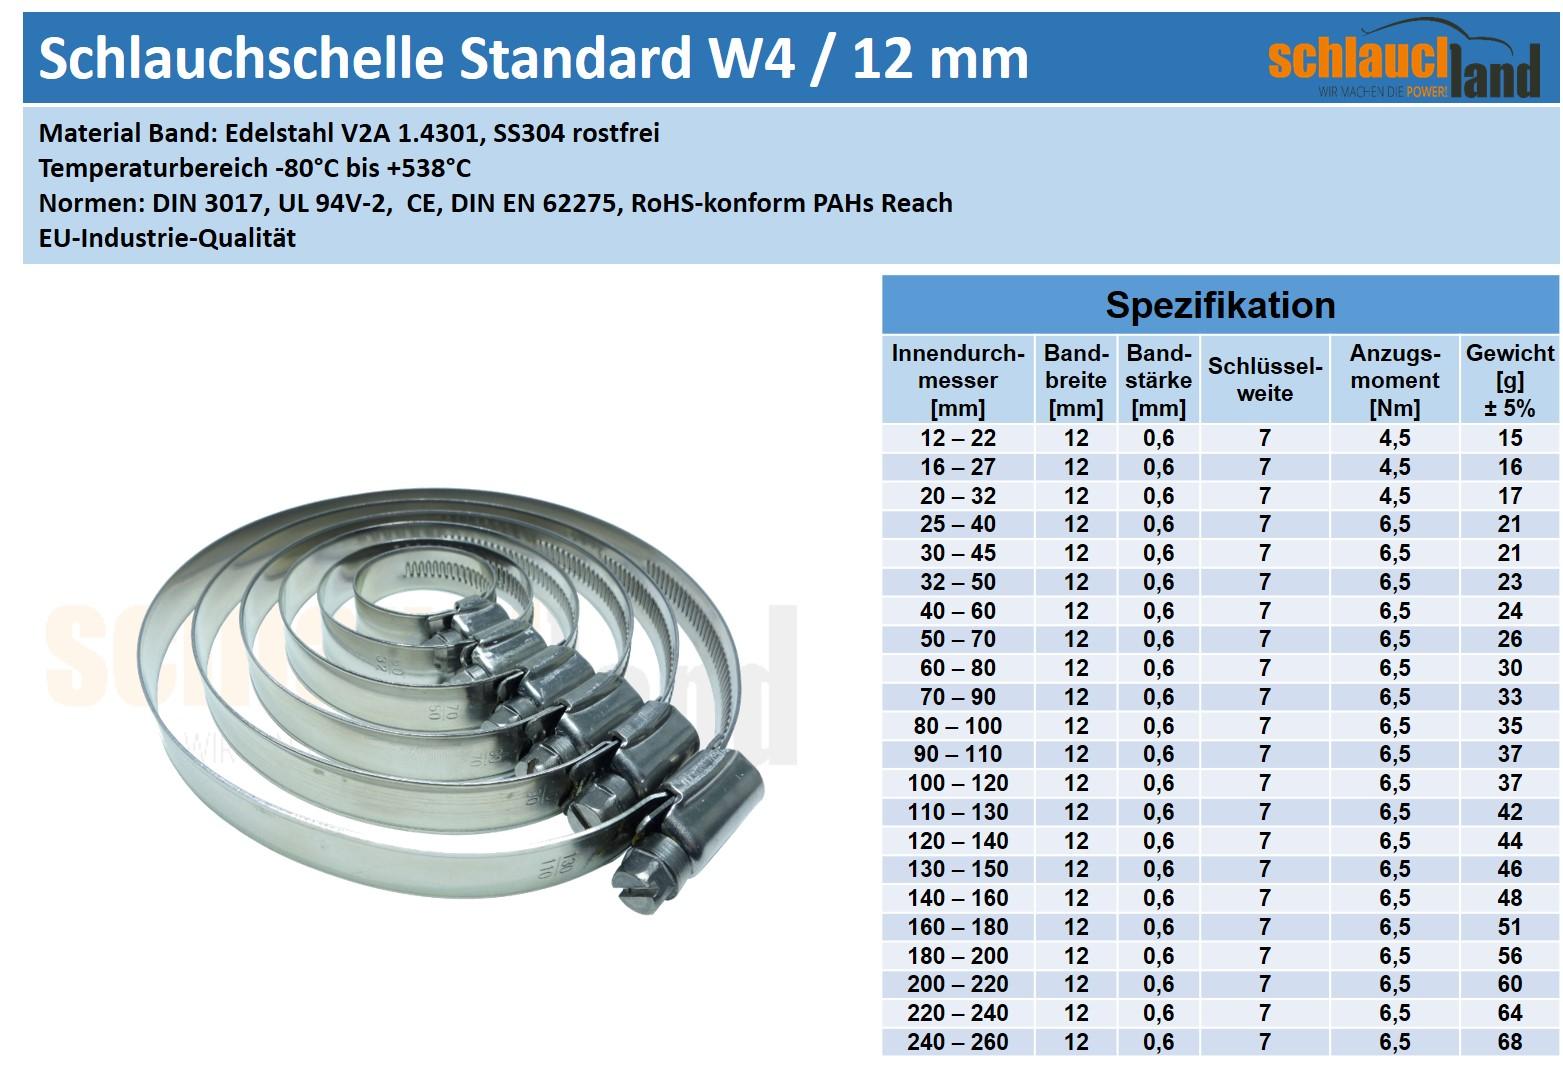 Datenblatt Edelstahlschelle Standard W4 / 12mm